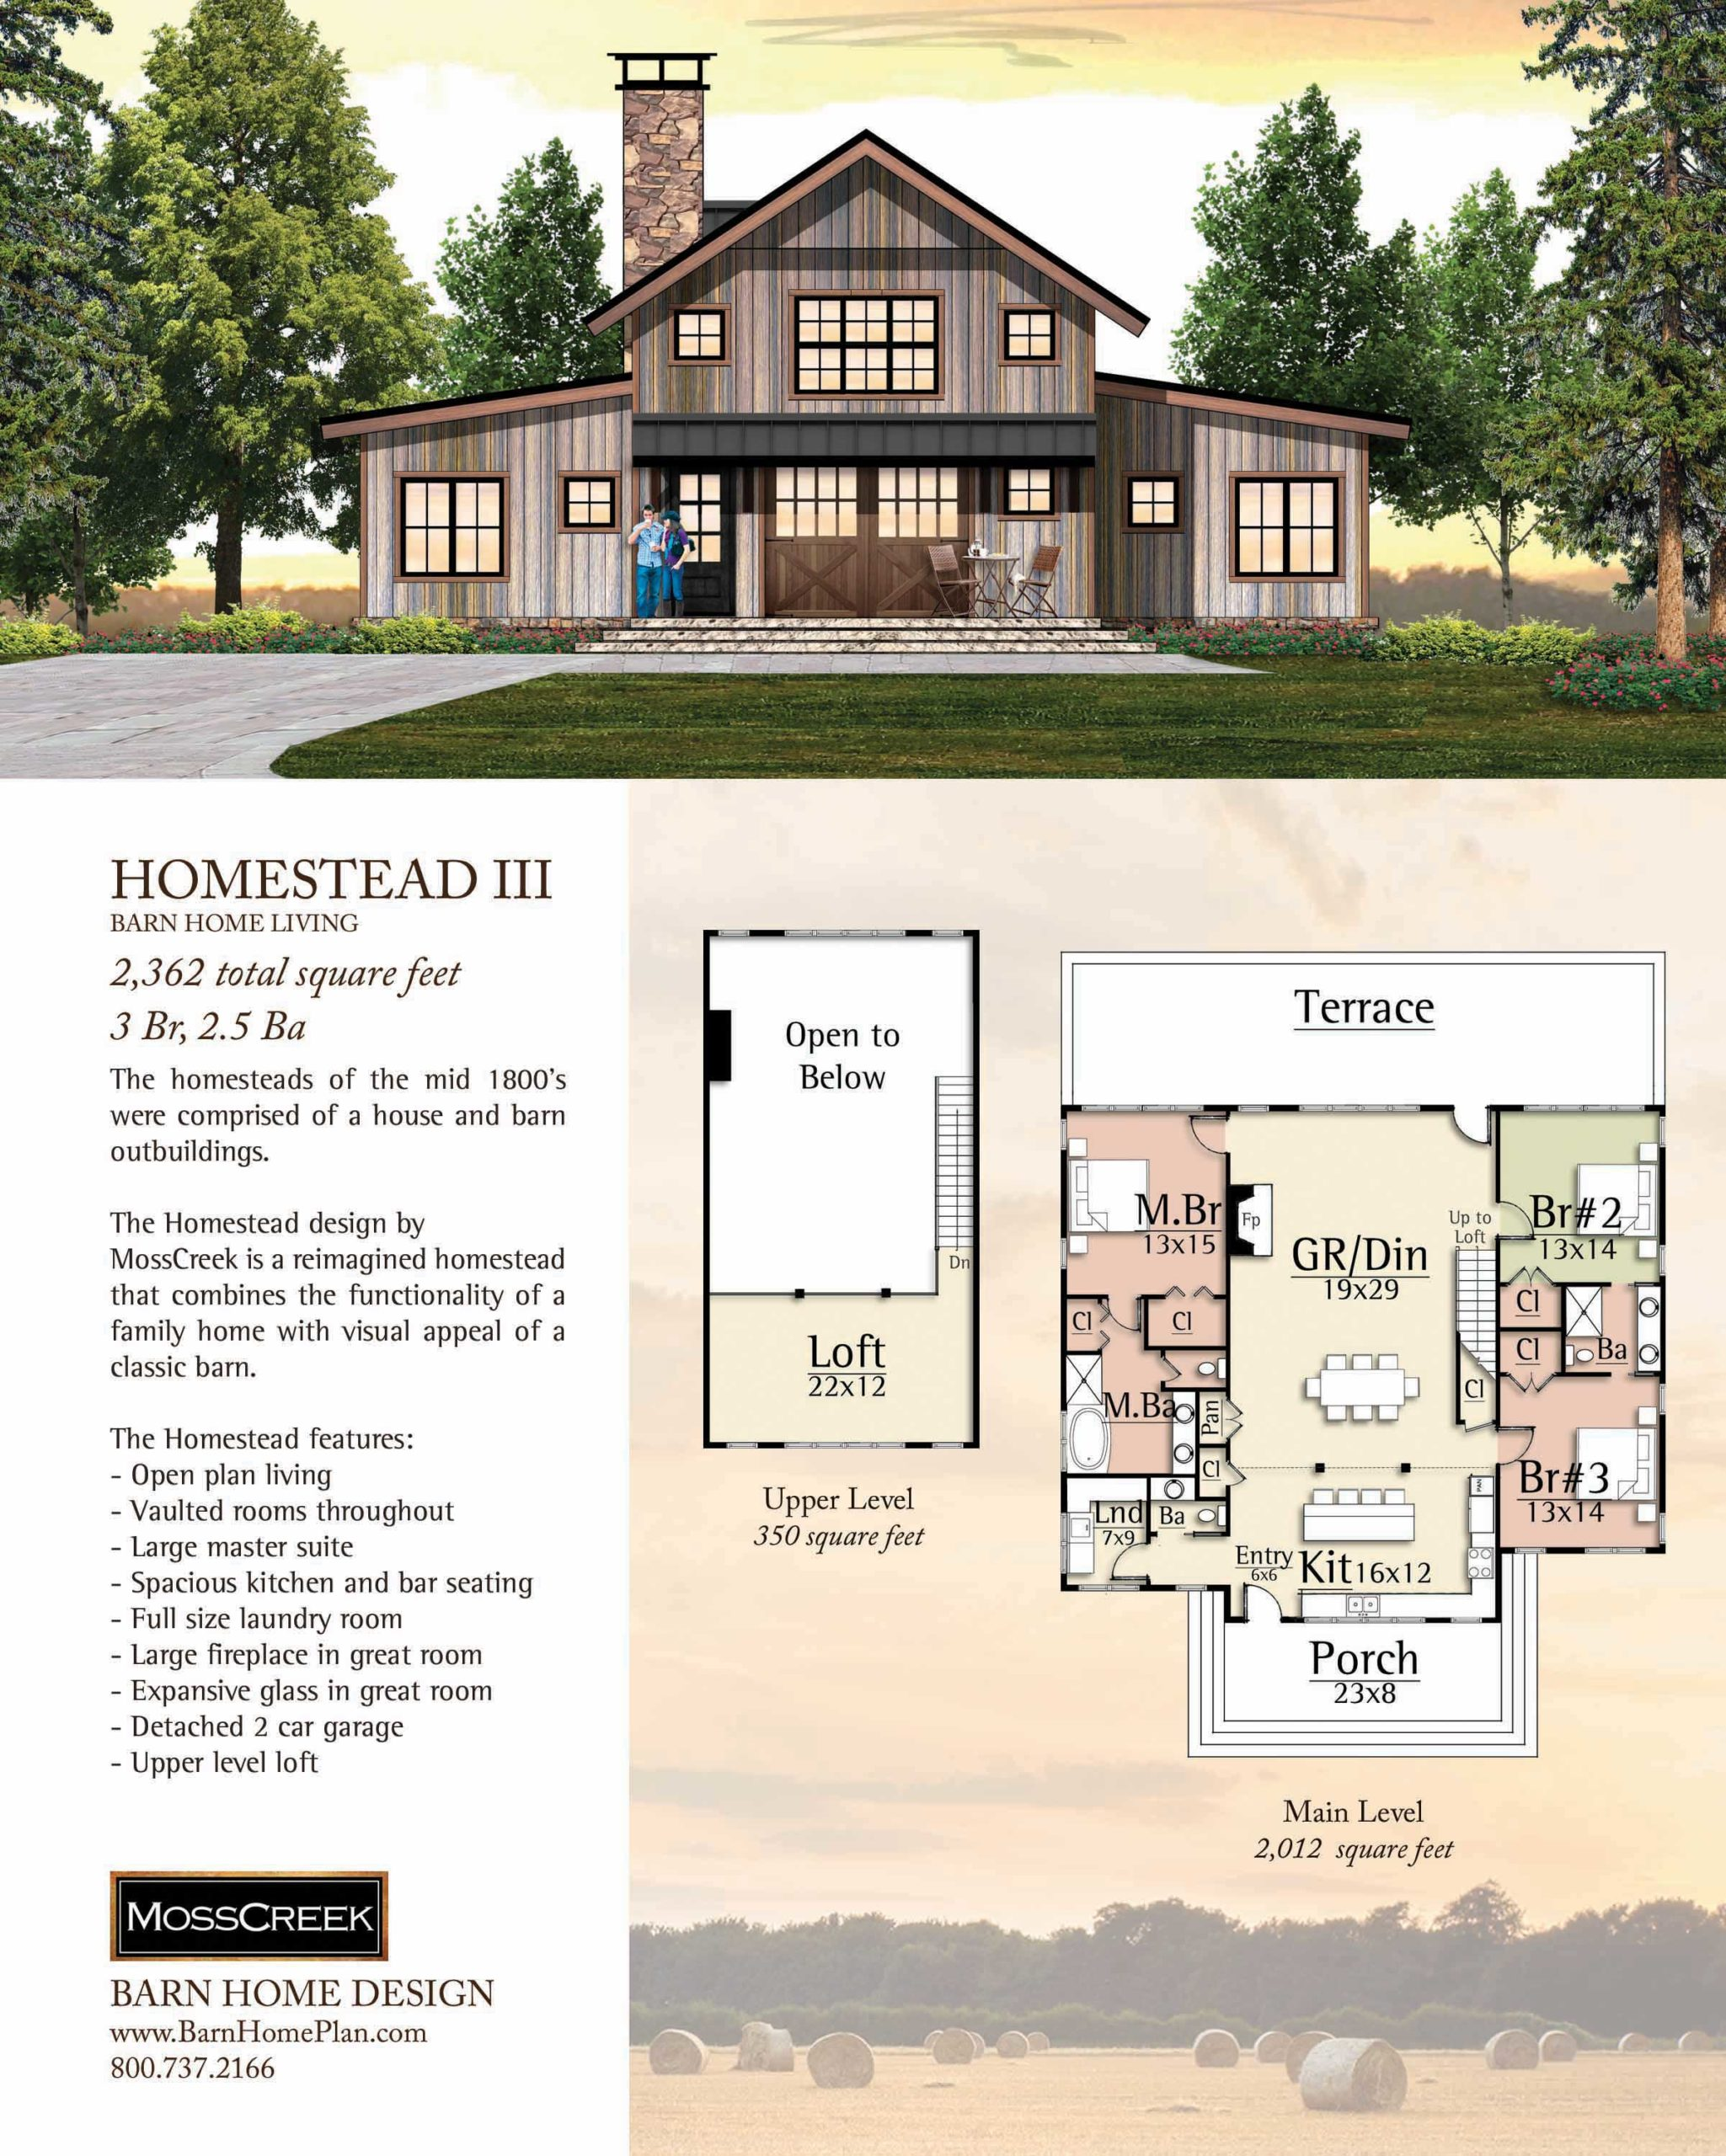 Mosscreek Homestead III Floorplan